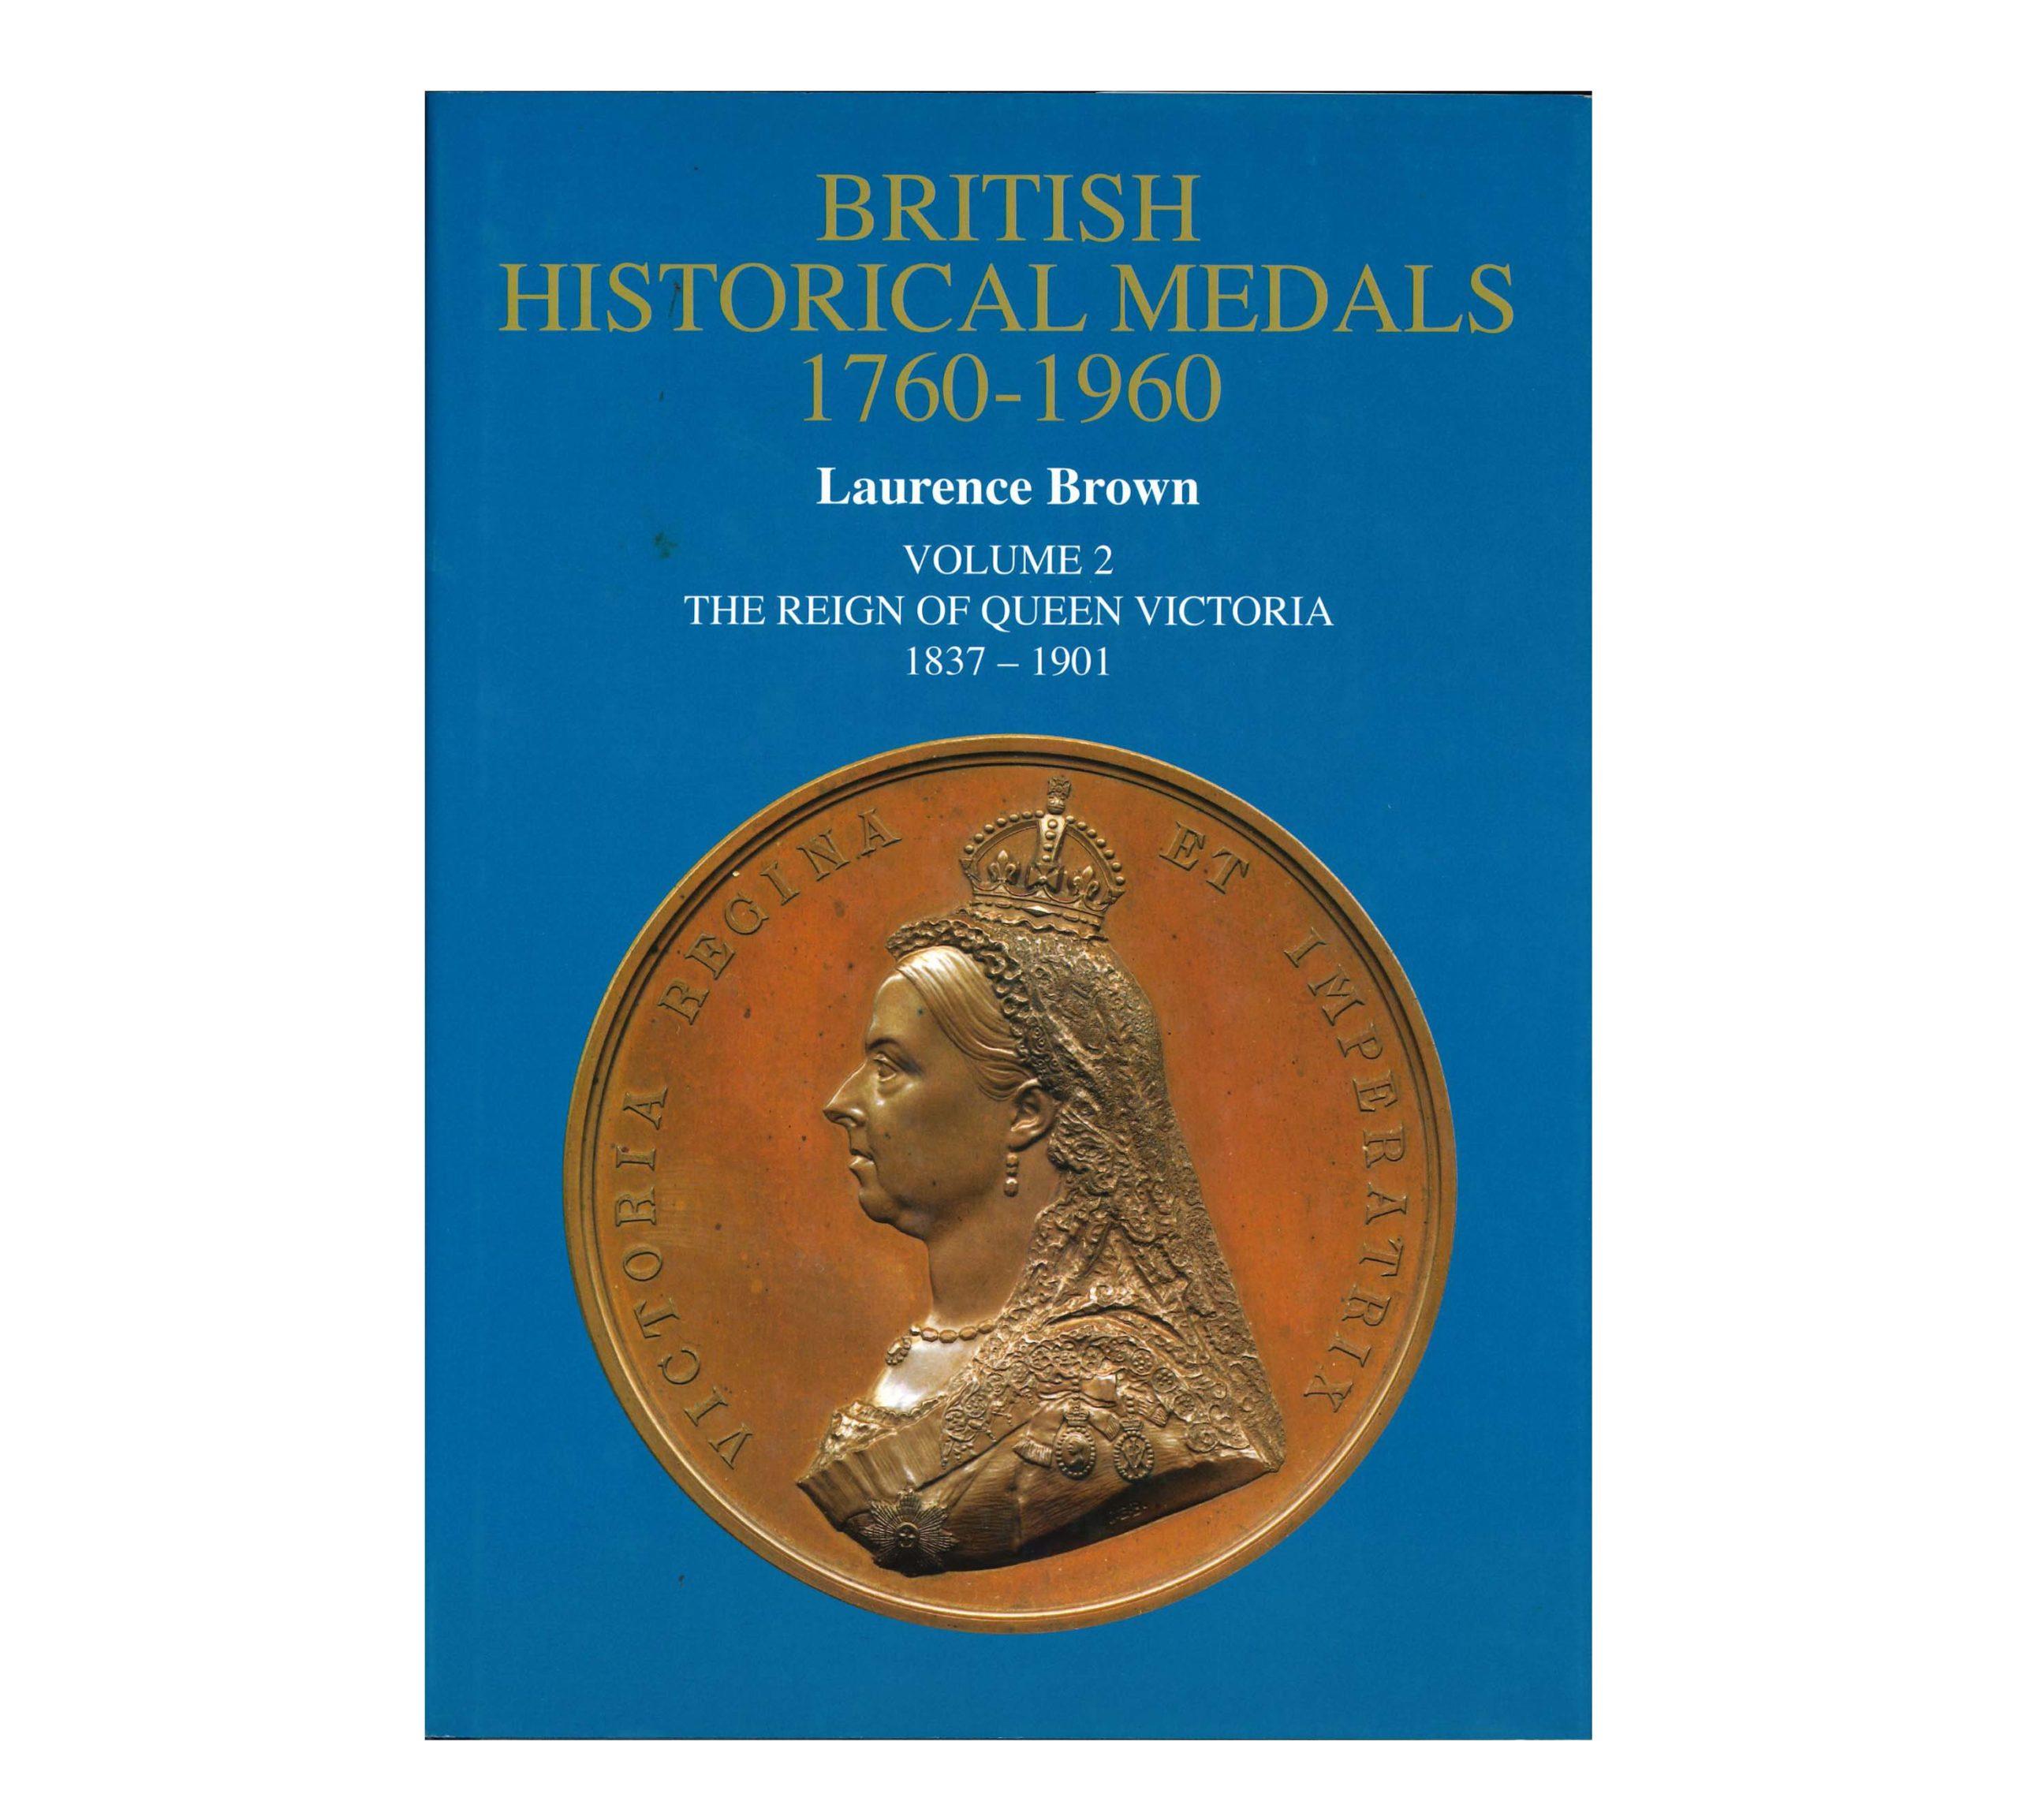 British Historical Medals 1760-1960